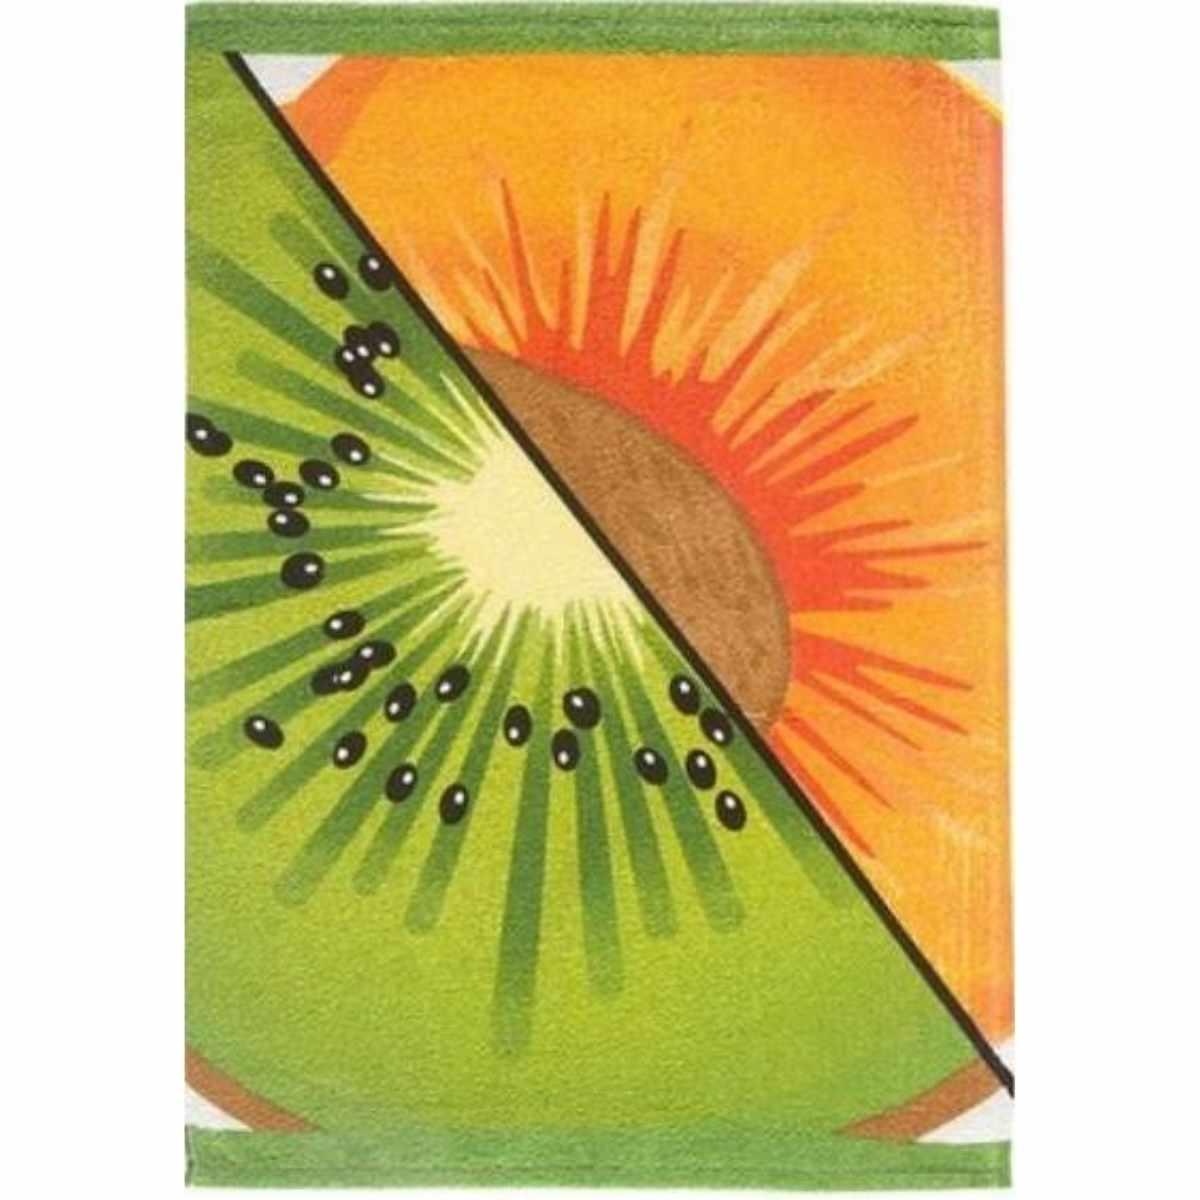 Pano de Copa Fiori  Fruit Mix 1